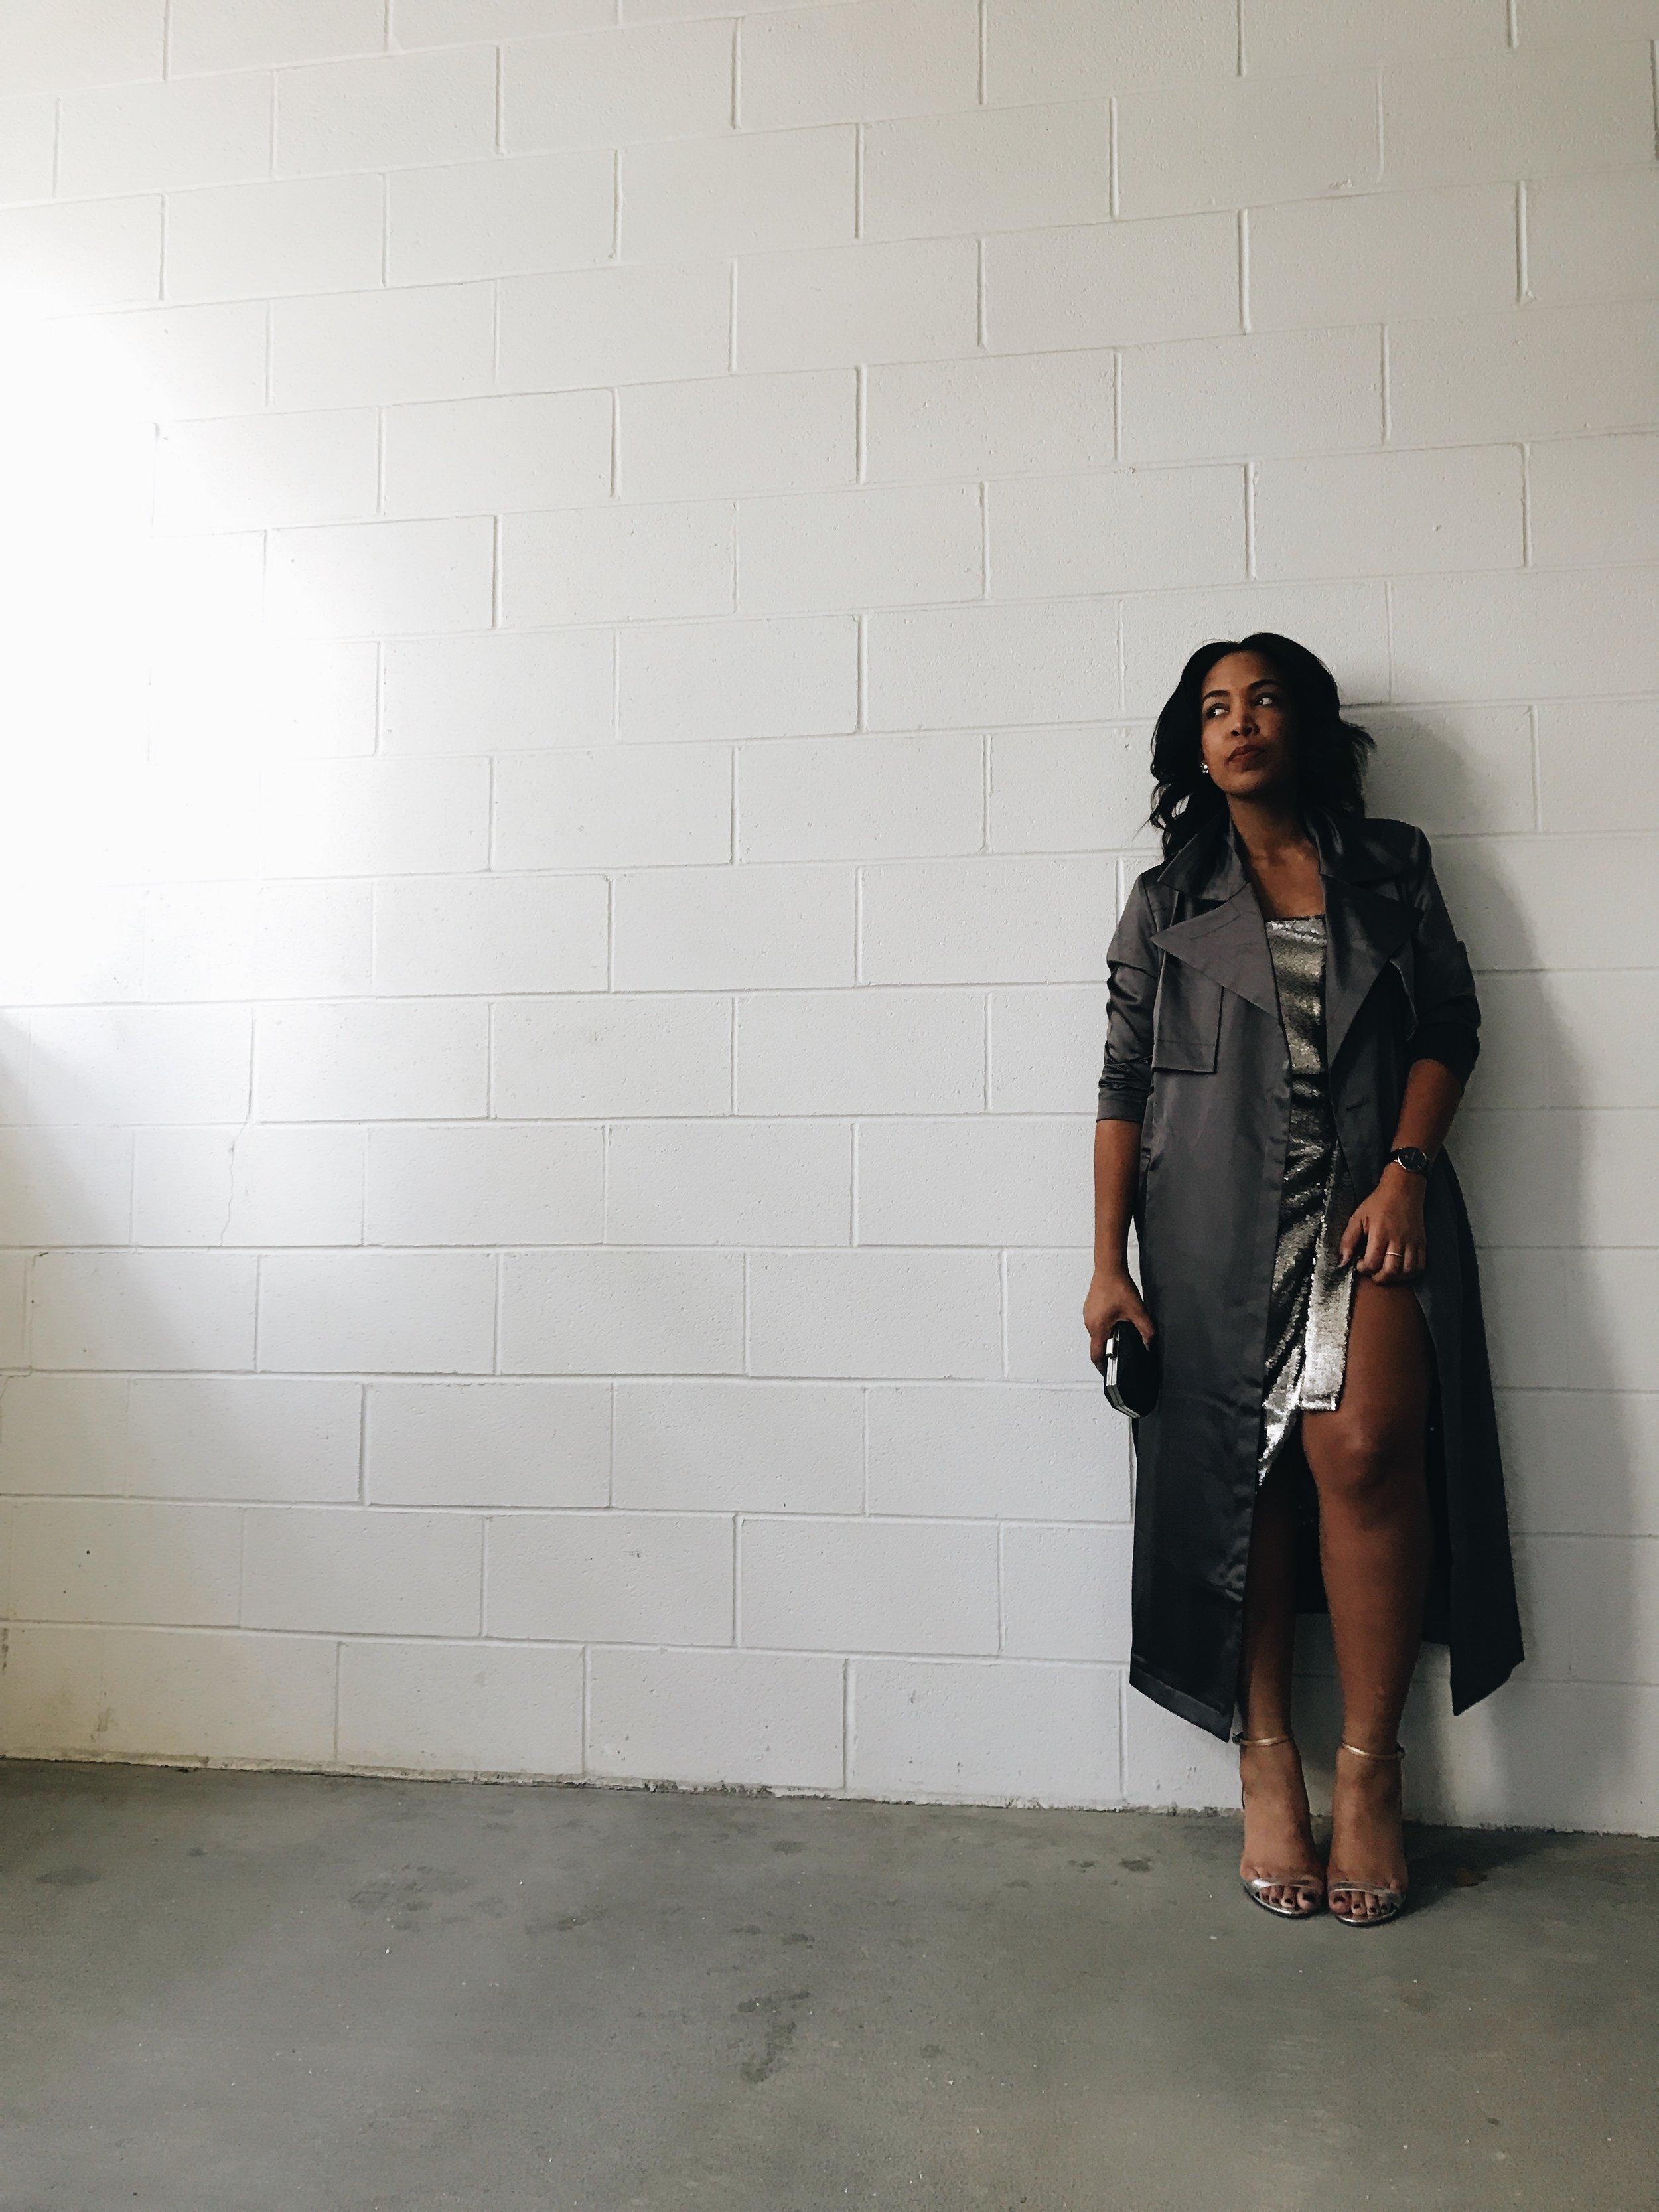 5-Lavish-Alice-Sequin-Dress-ASOS-Satin-Trench-Coat-Metallic-Heels-NYE-outfit.jpg